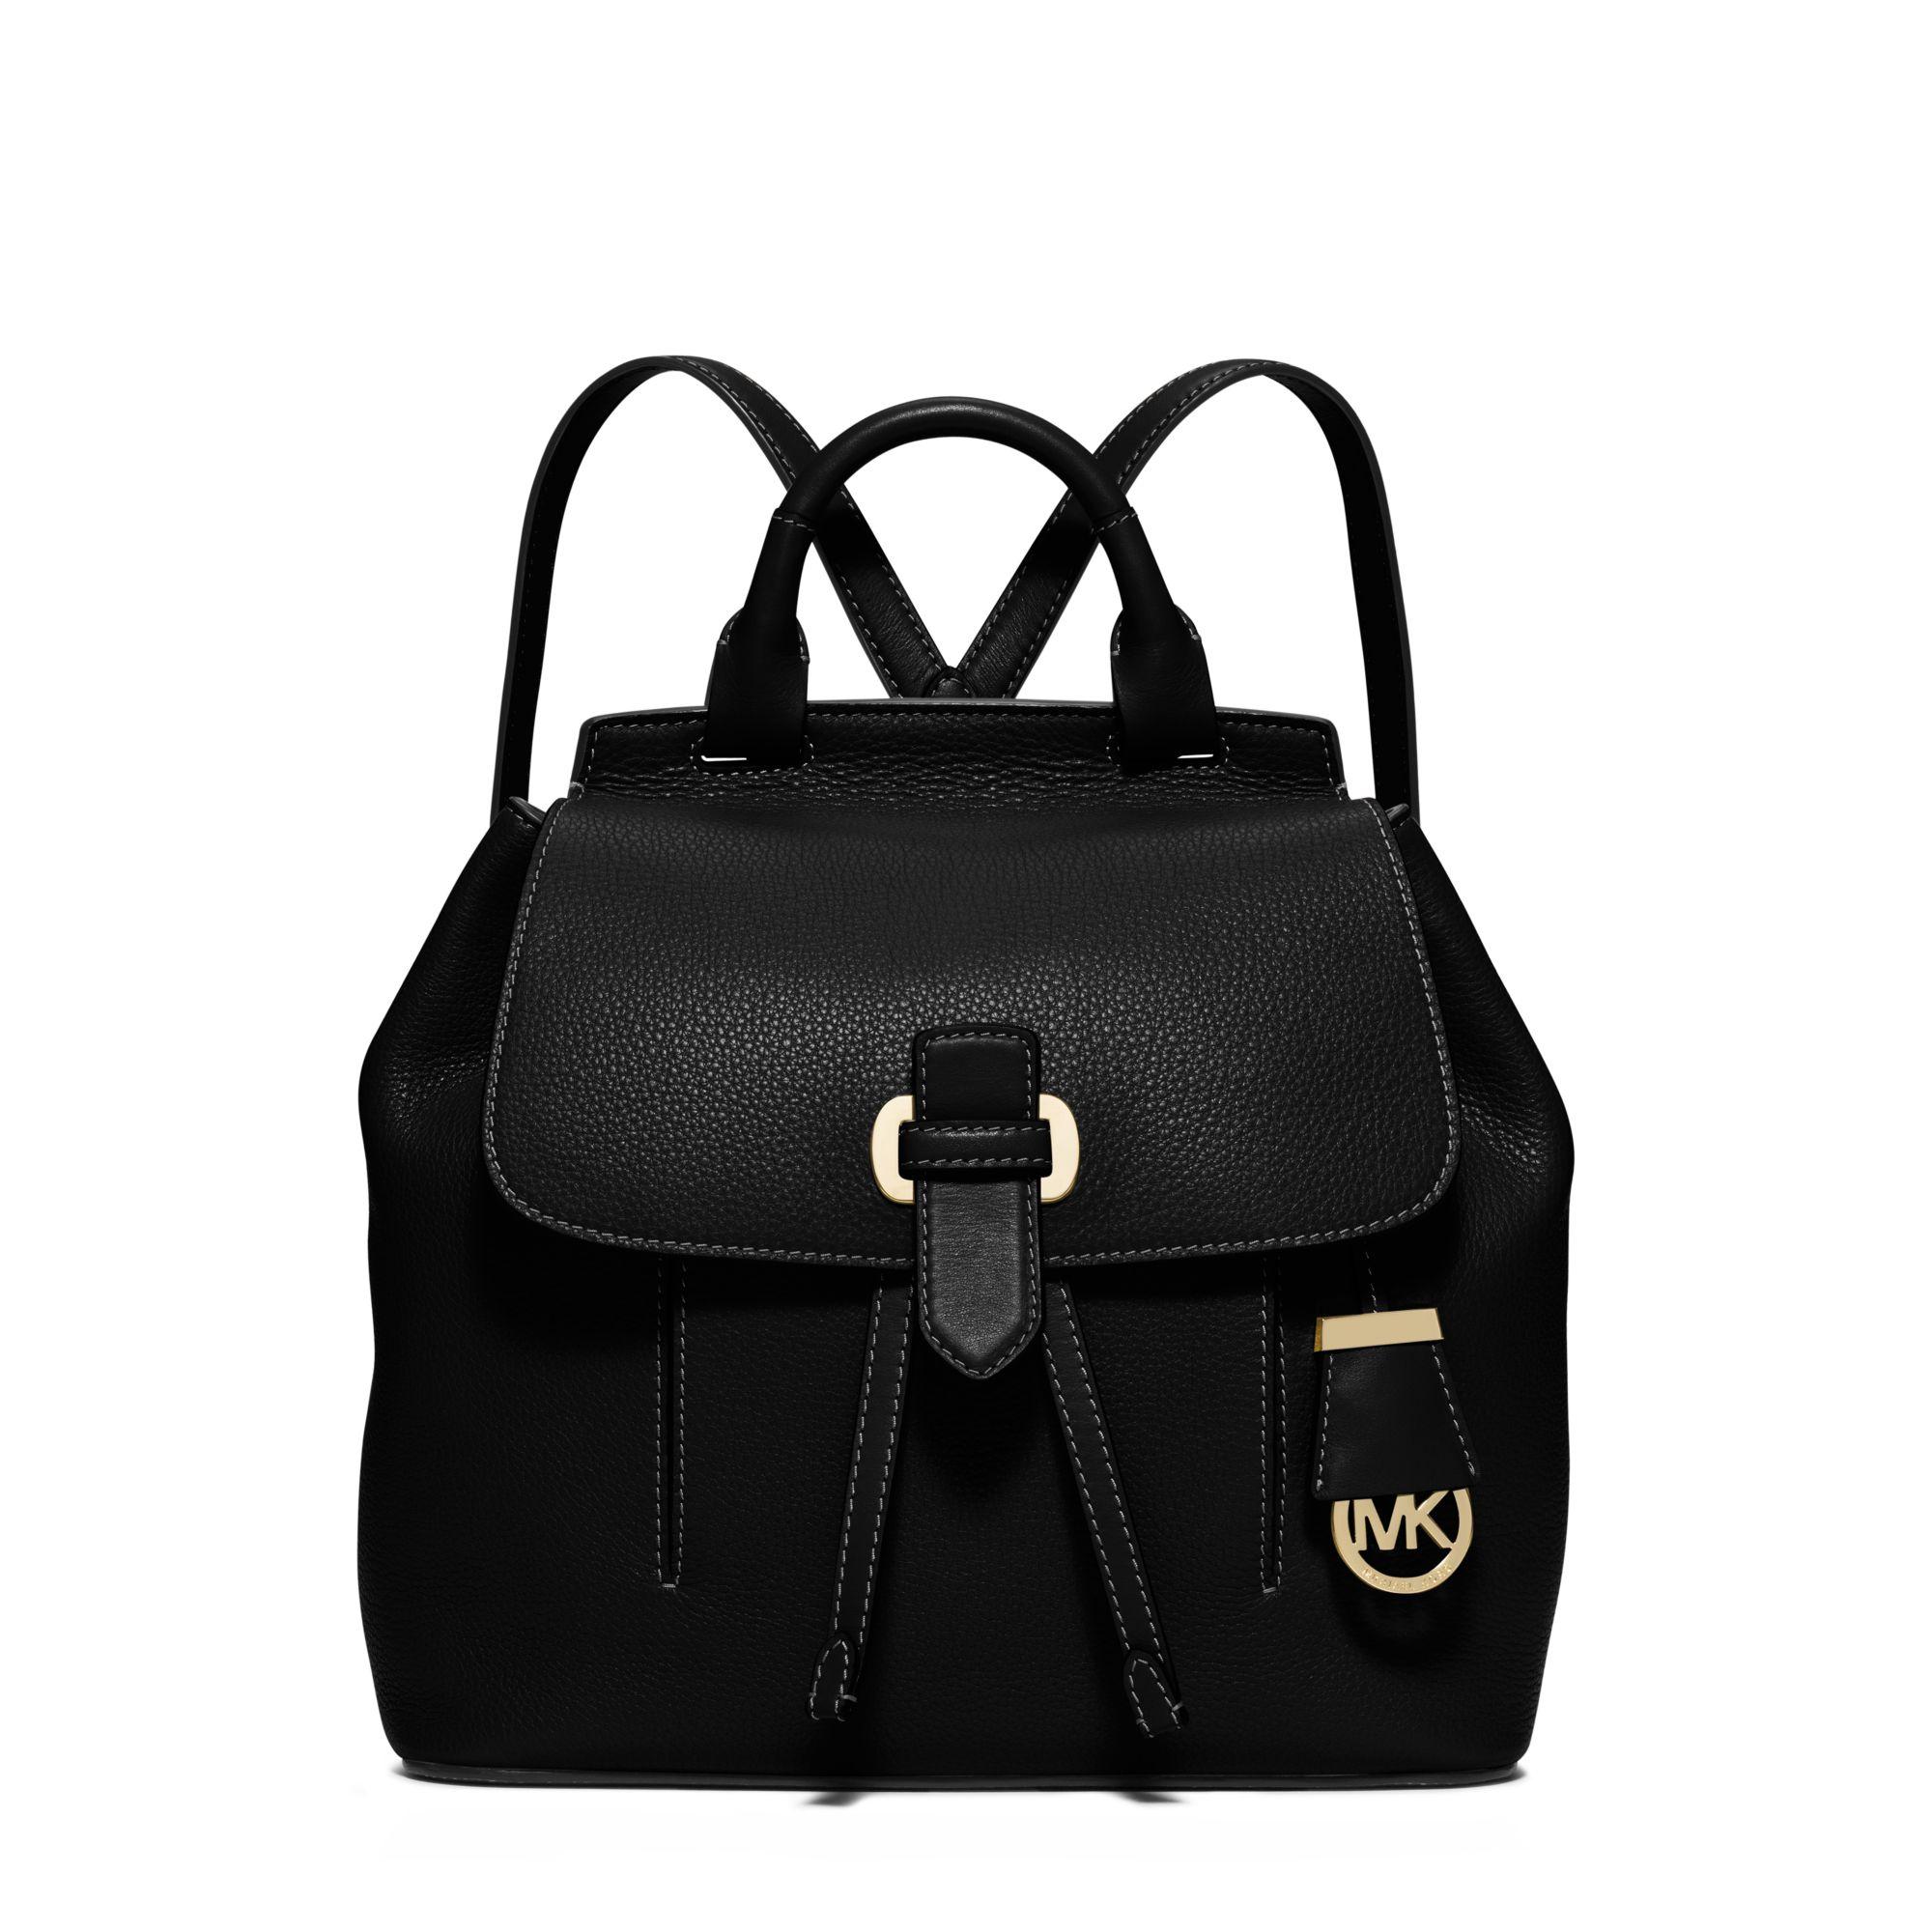 4c4399ca042d Lyst - Michael Kors Romy Medium Leather Backpack in Black